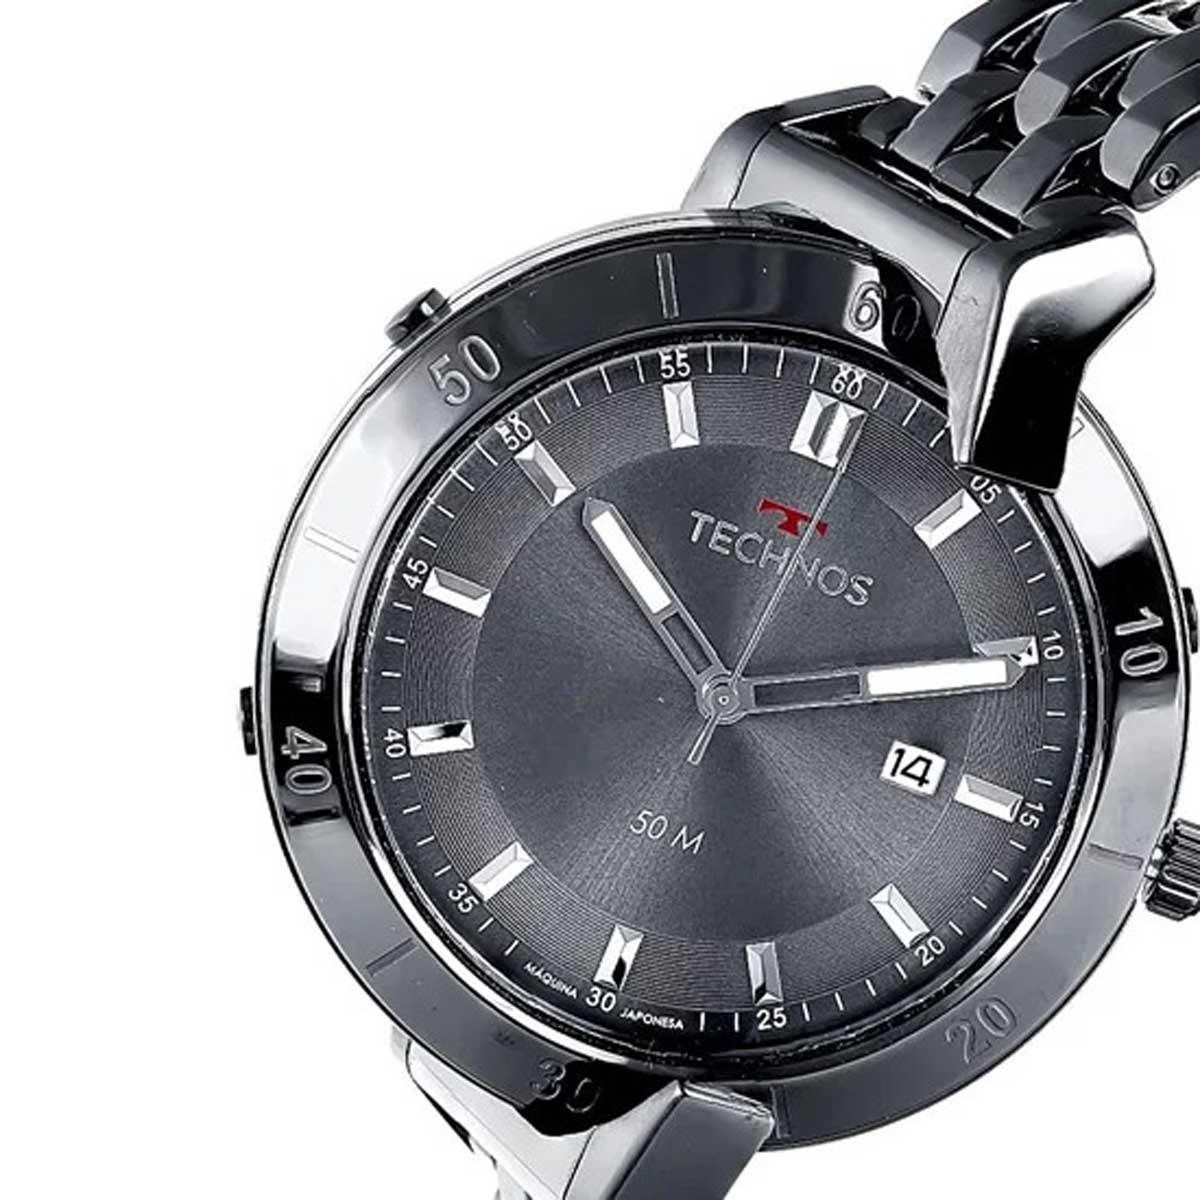 Relógio Technos Masculino Curvas Duplo Ionizado 1S13CR/4